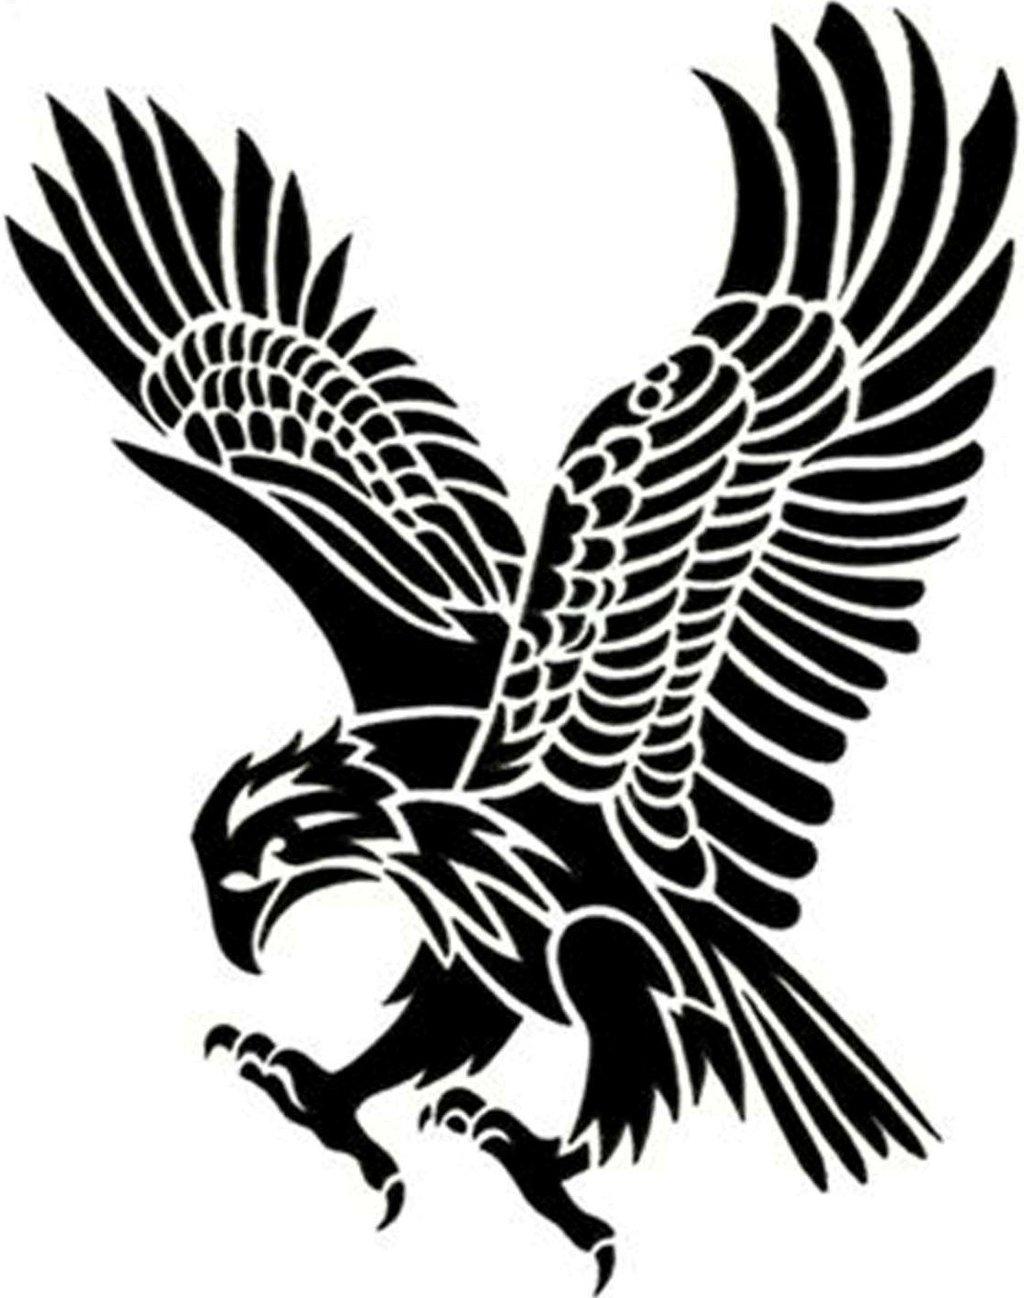 14 Cool Eagle Designs Images - Eagle Feather Tattoo Designs